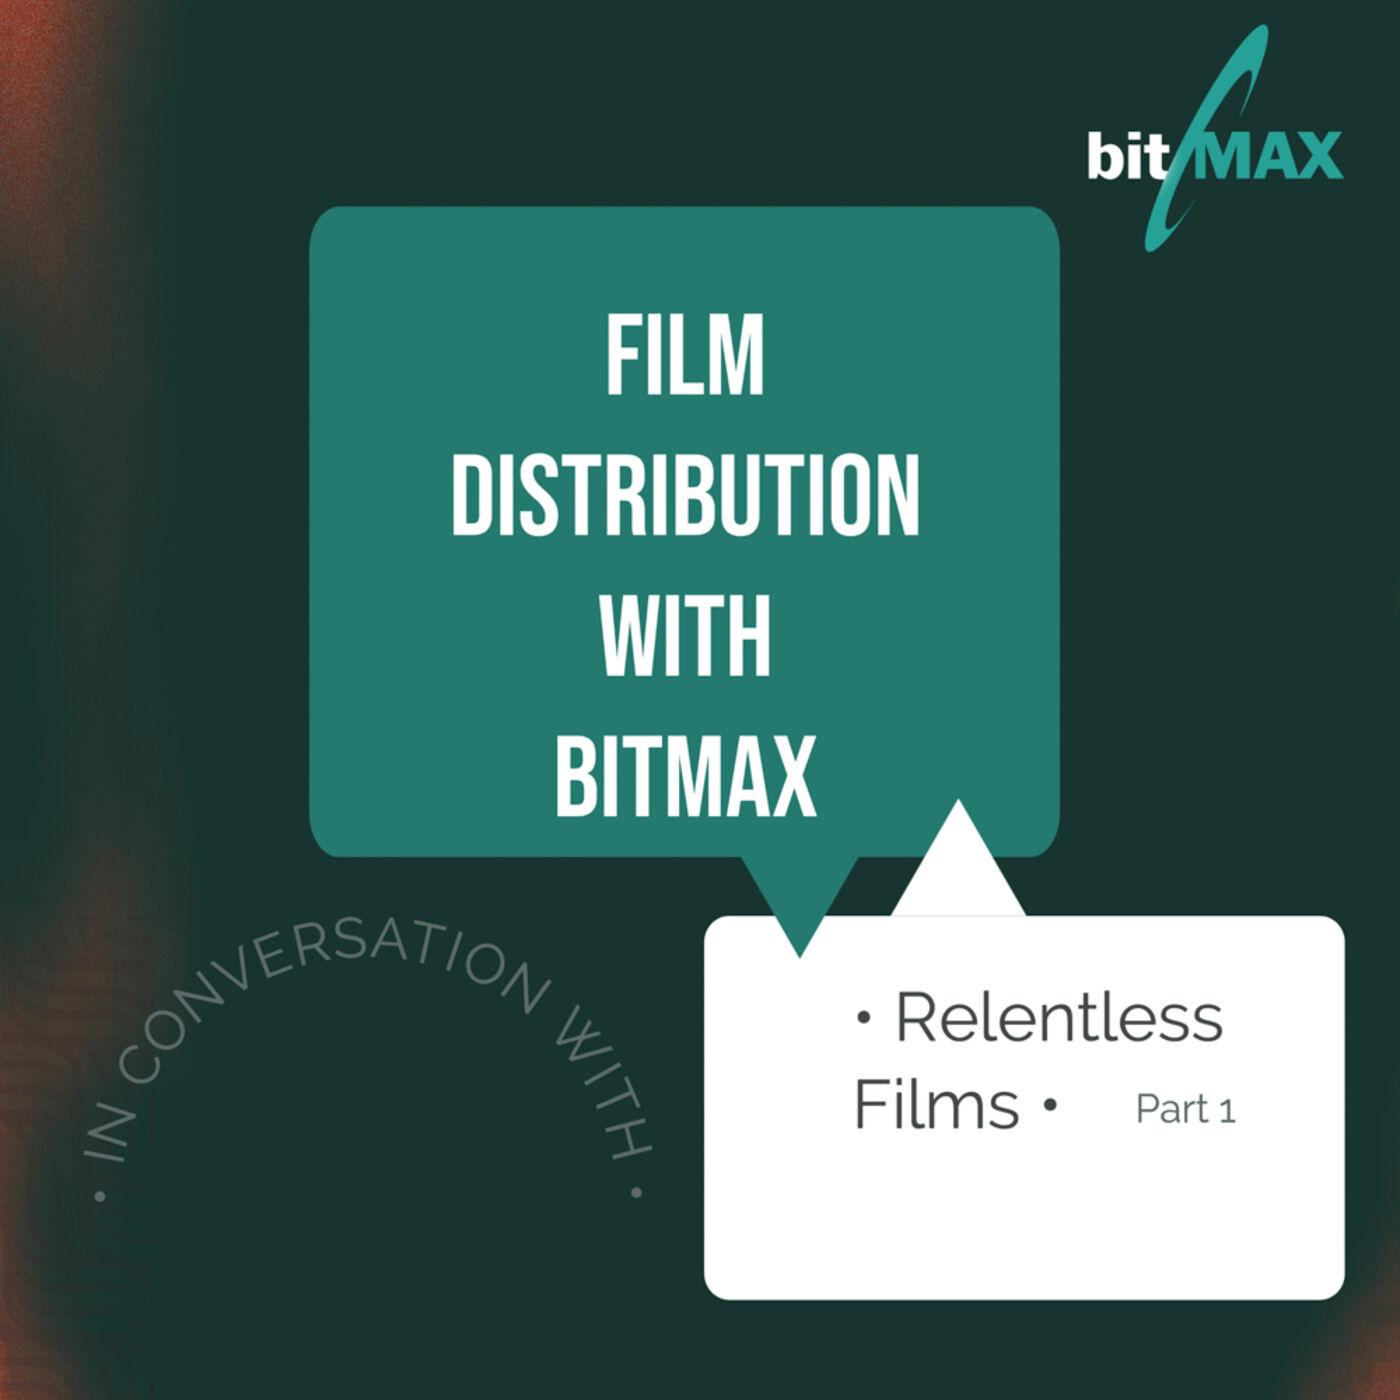 Episode 2: Relentless Films with Riyad Barmania & Linton Davies Part 1